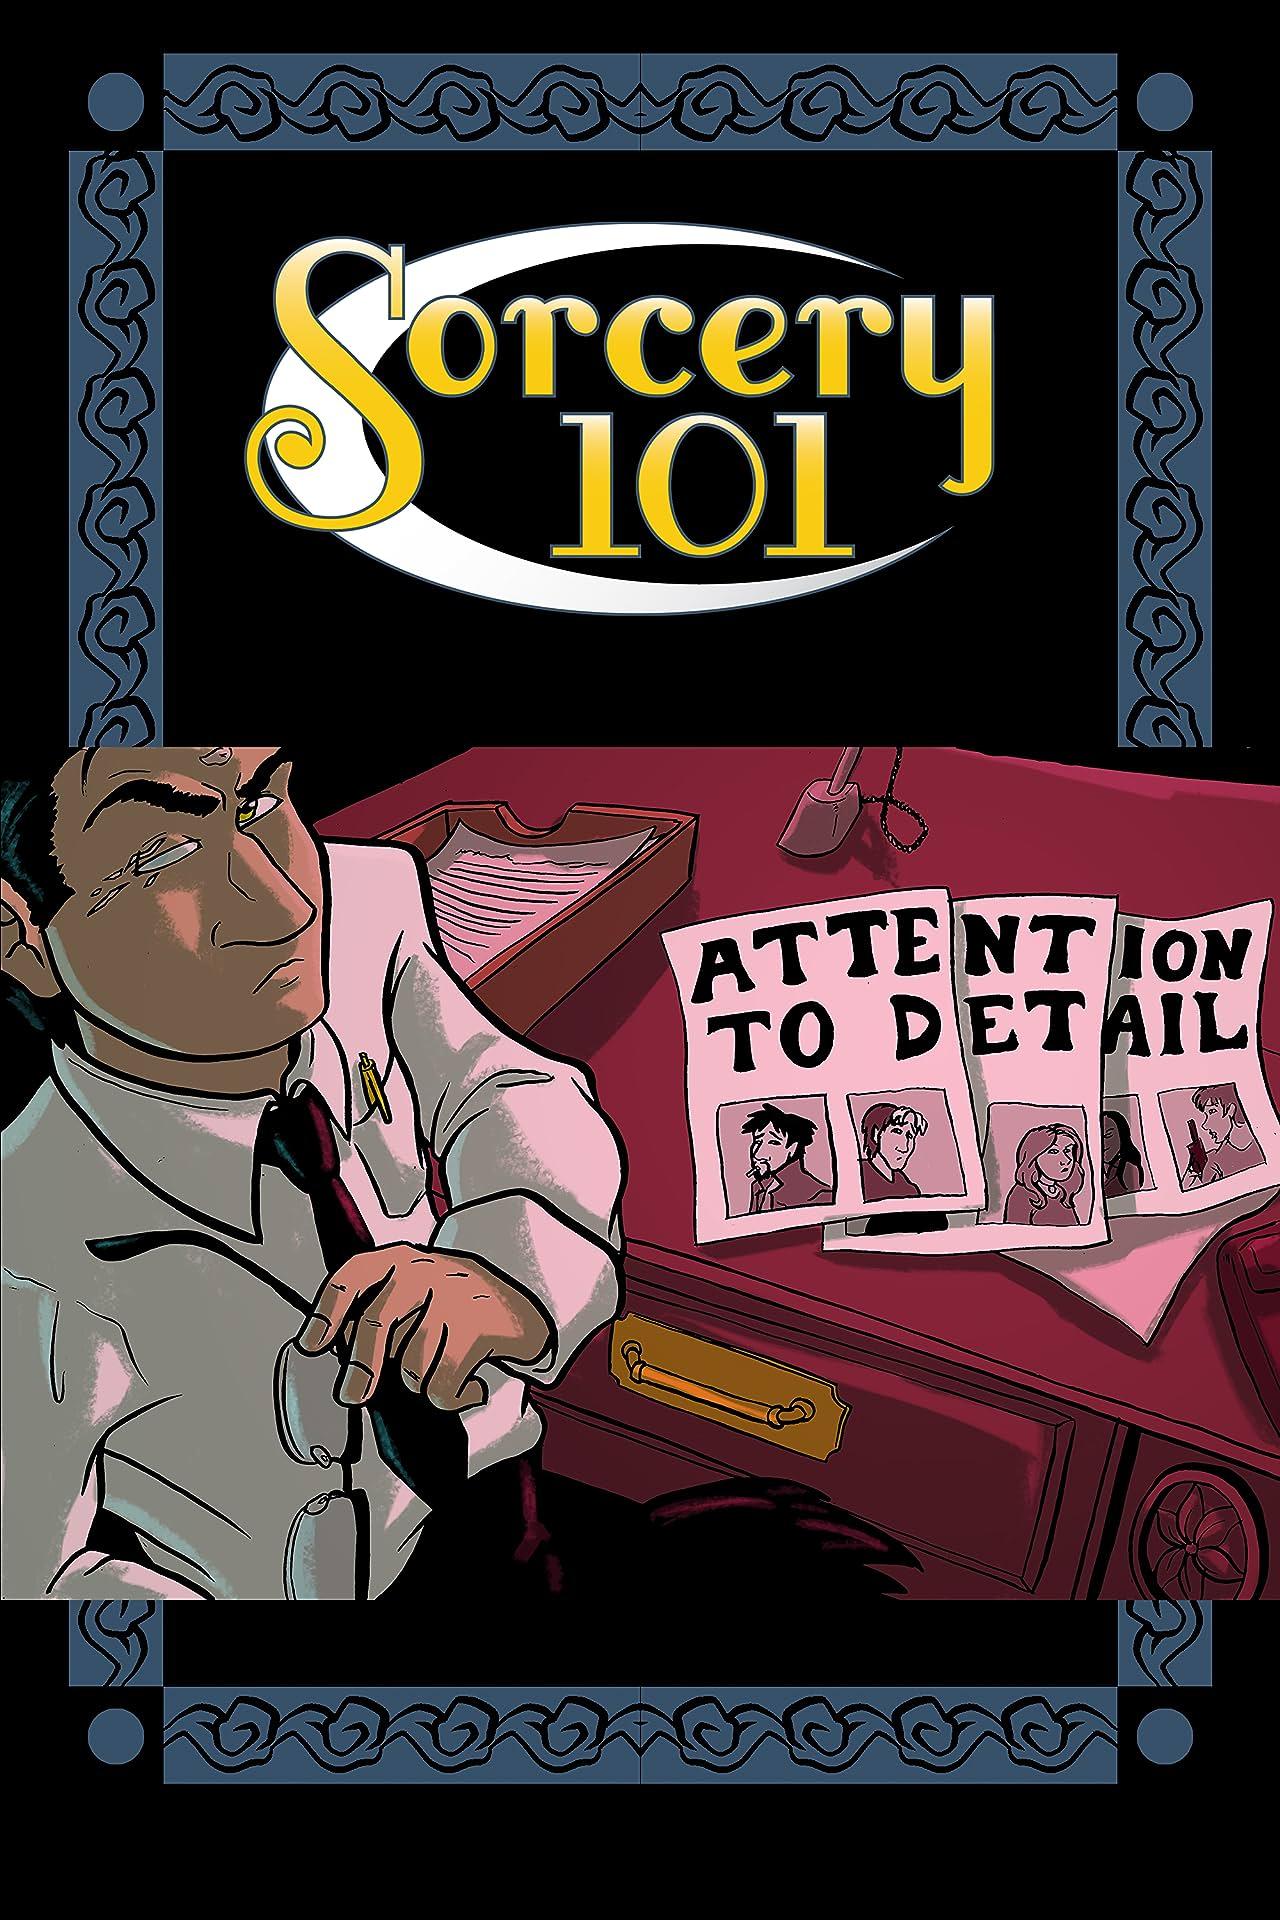 Sorcery 101 #19